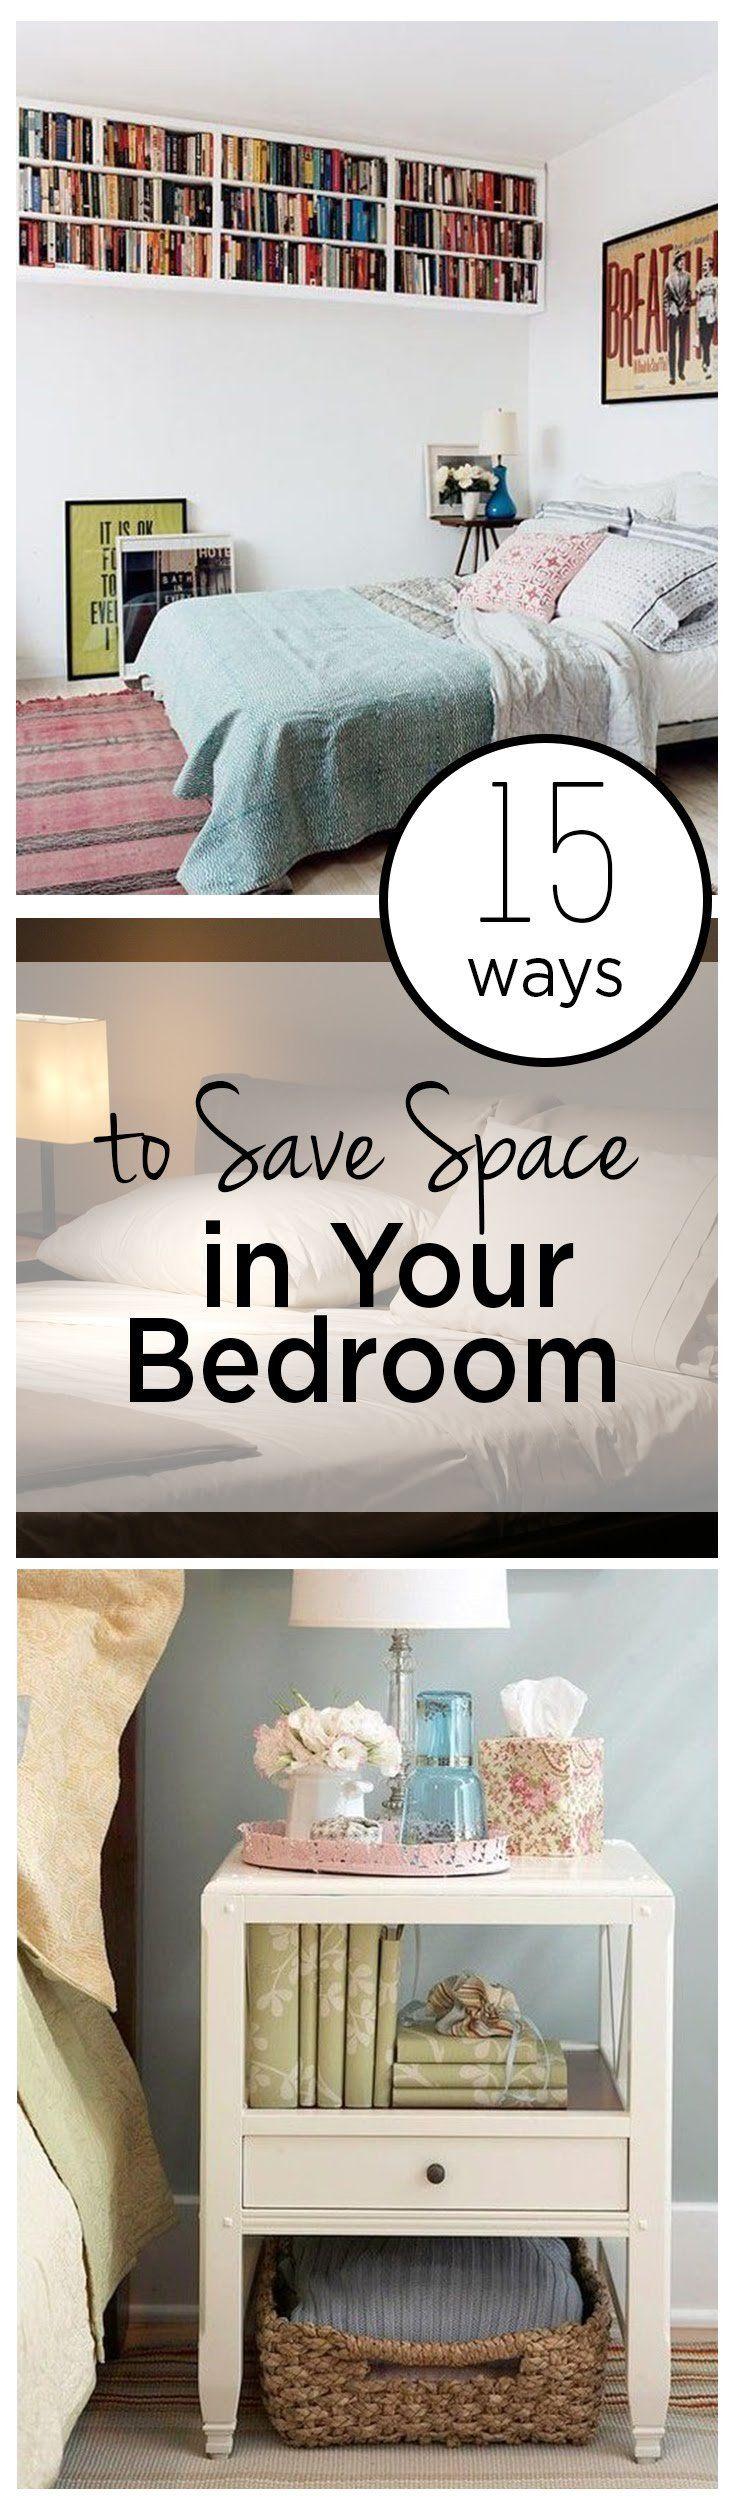 Bedroom decorations, bedroom decor, DIY bedroom storage, bedroom storage, popular pin, DIY home storage, organization, organization hacks, bedroom